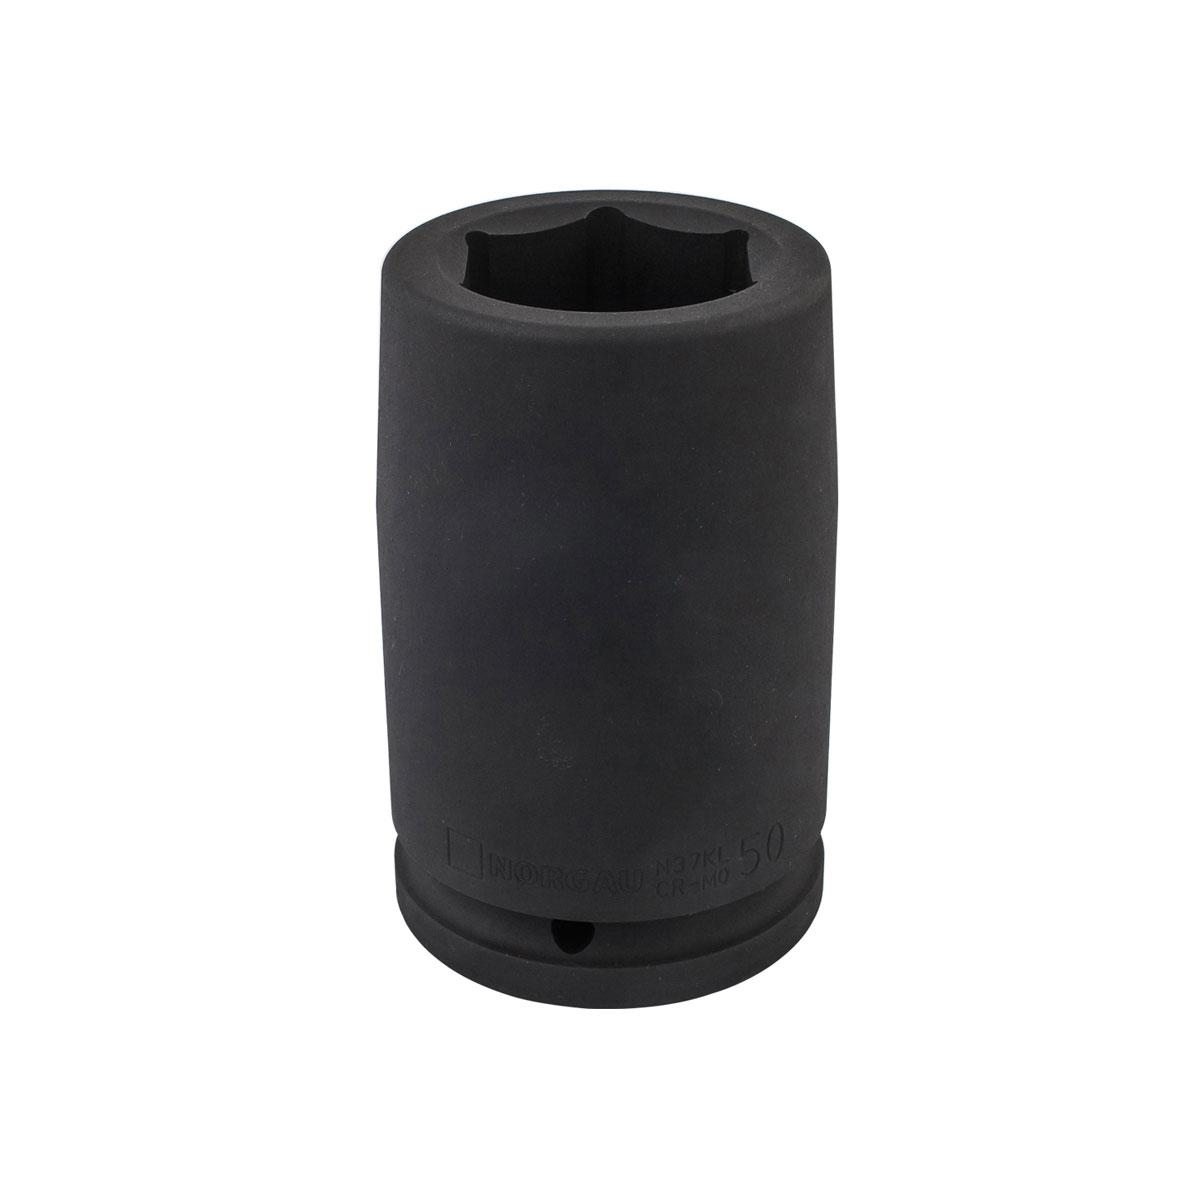 Головка Norgau N37kl-65 (064085065) головка norgau n37kl 80 064085080